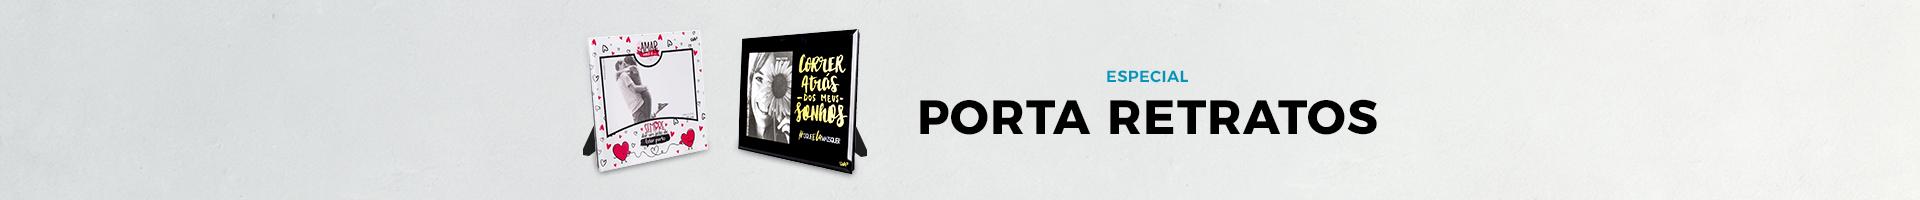 CATALOGO PORTA RETRATOS